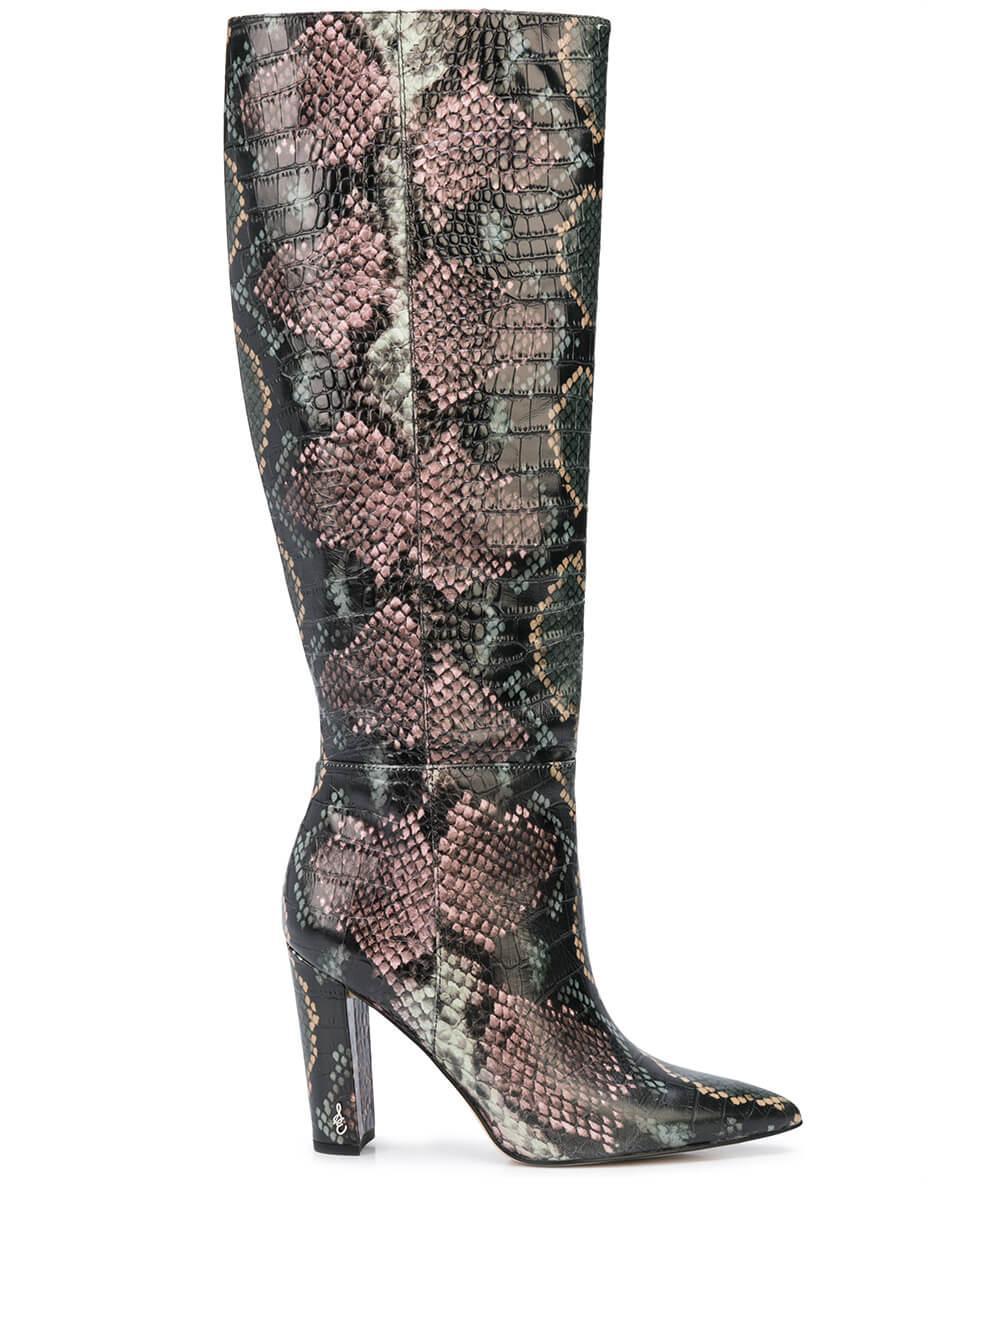 Tall Snake Print Boot